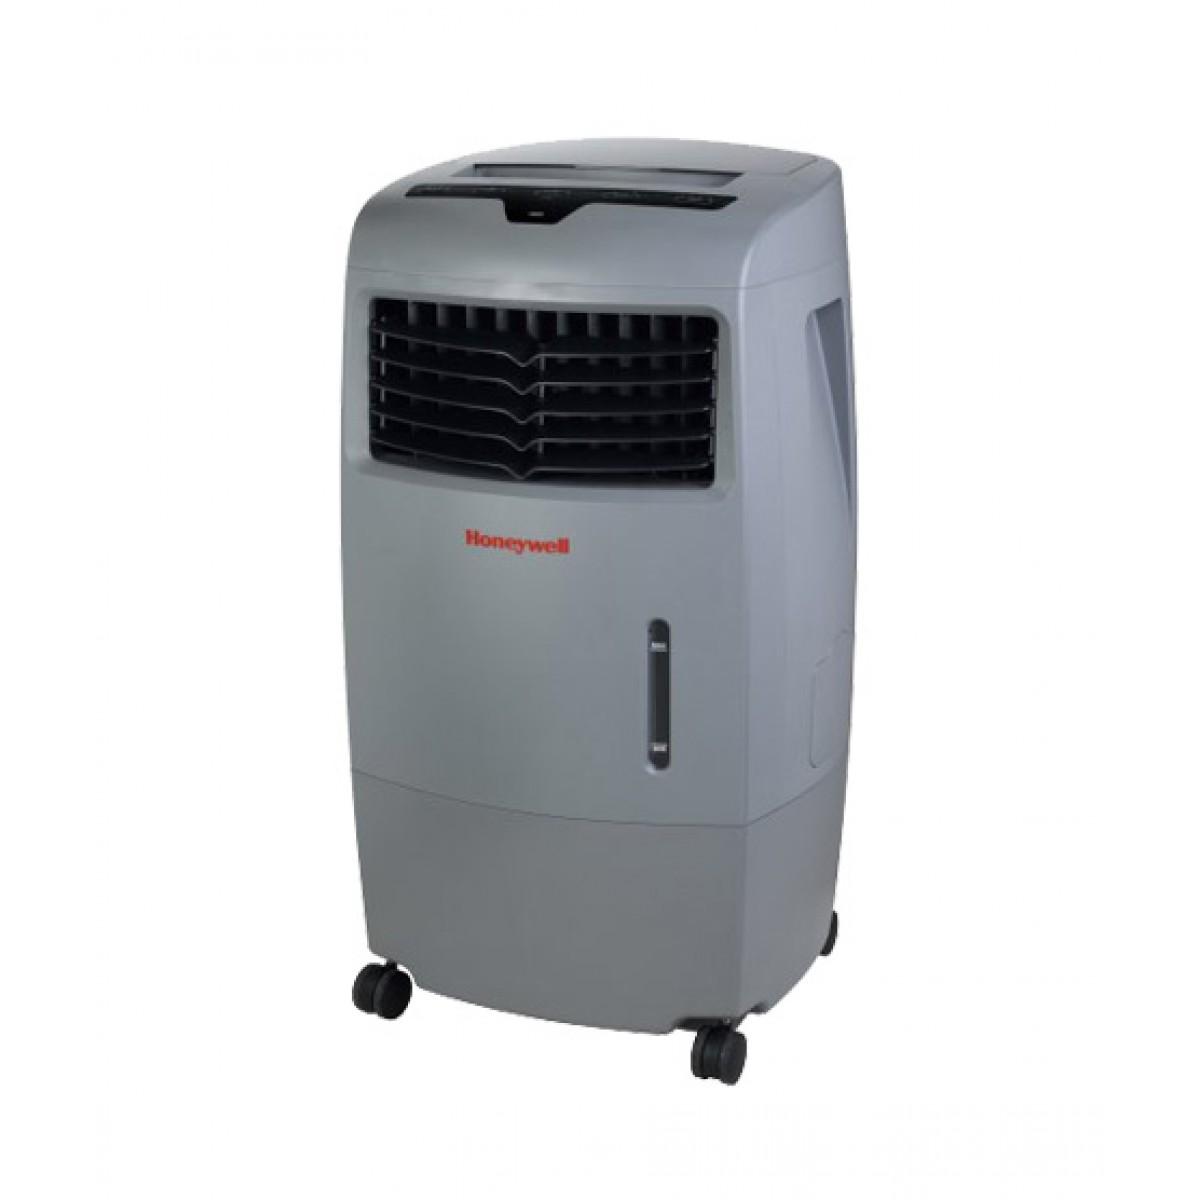 Omtalade Honeywell 25-Liter Evaporative Air Cooler Price in Pakistan   Buy TG-79